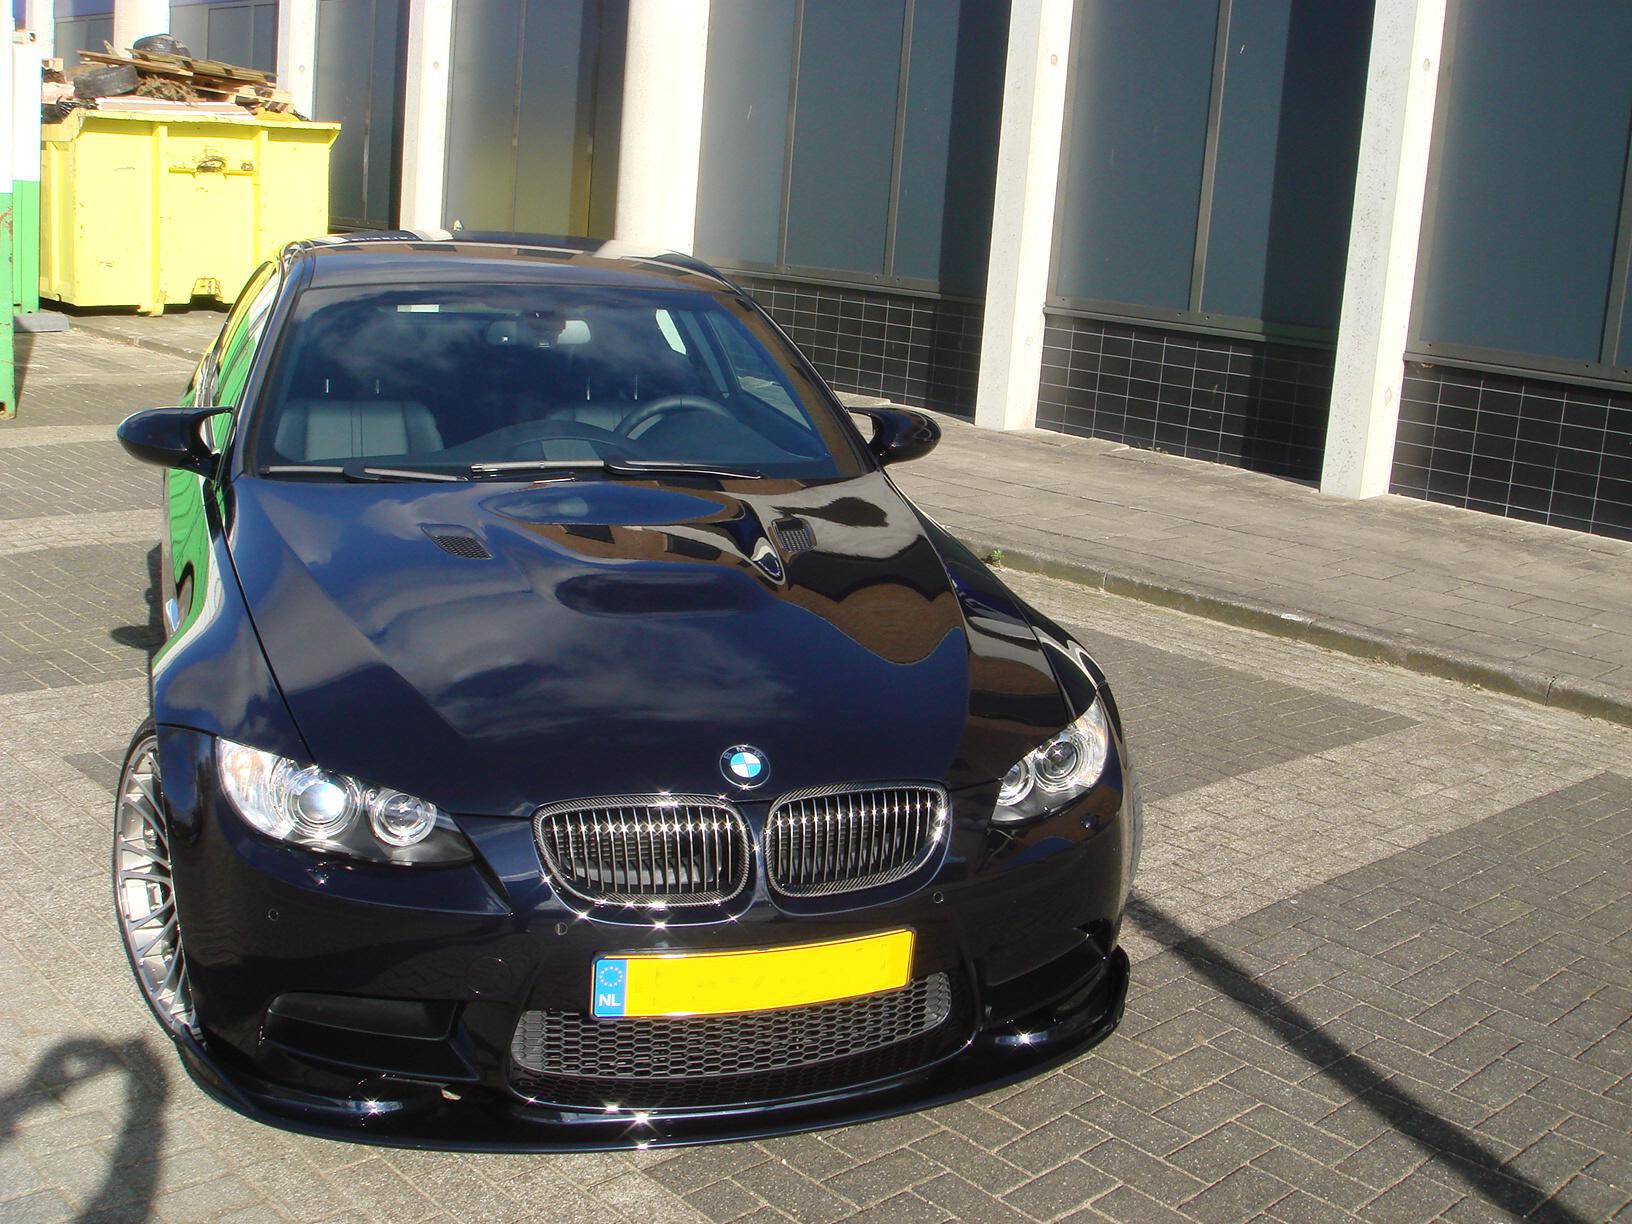 Modded jerez black M3 E92 pics-dsc01946ch7.jpg